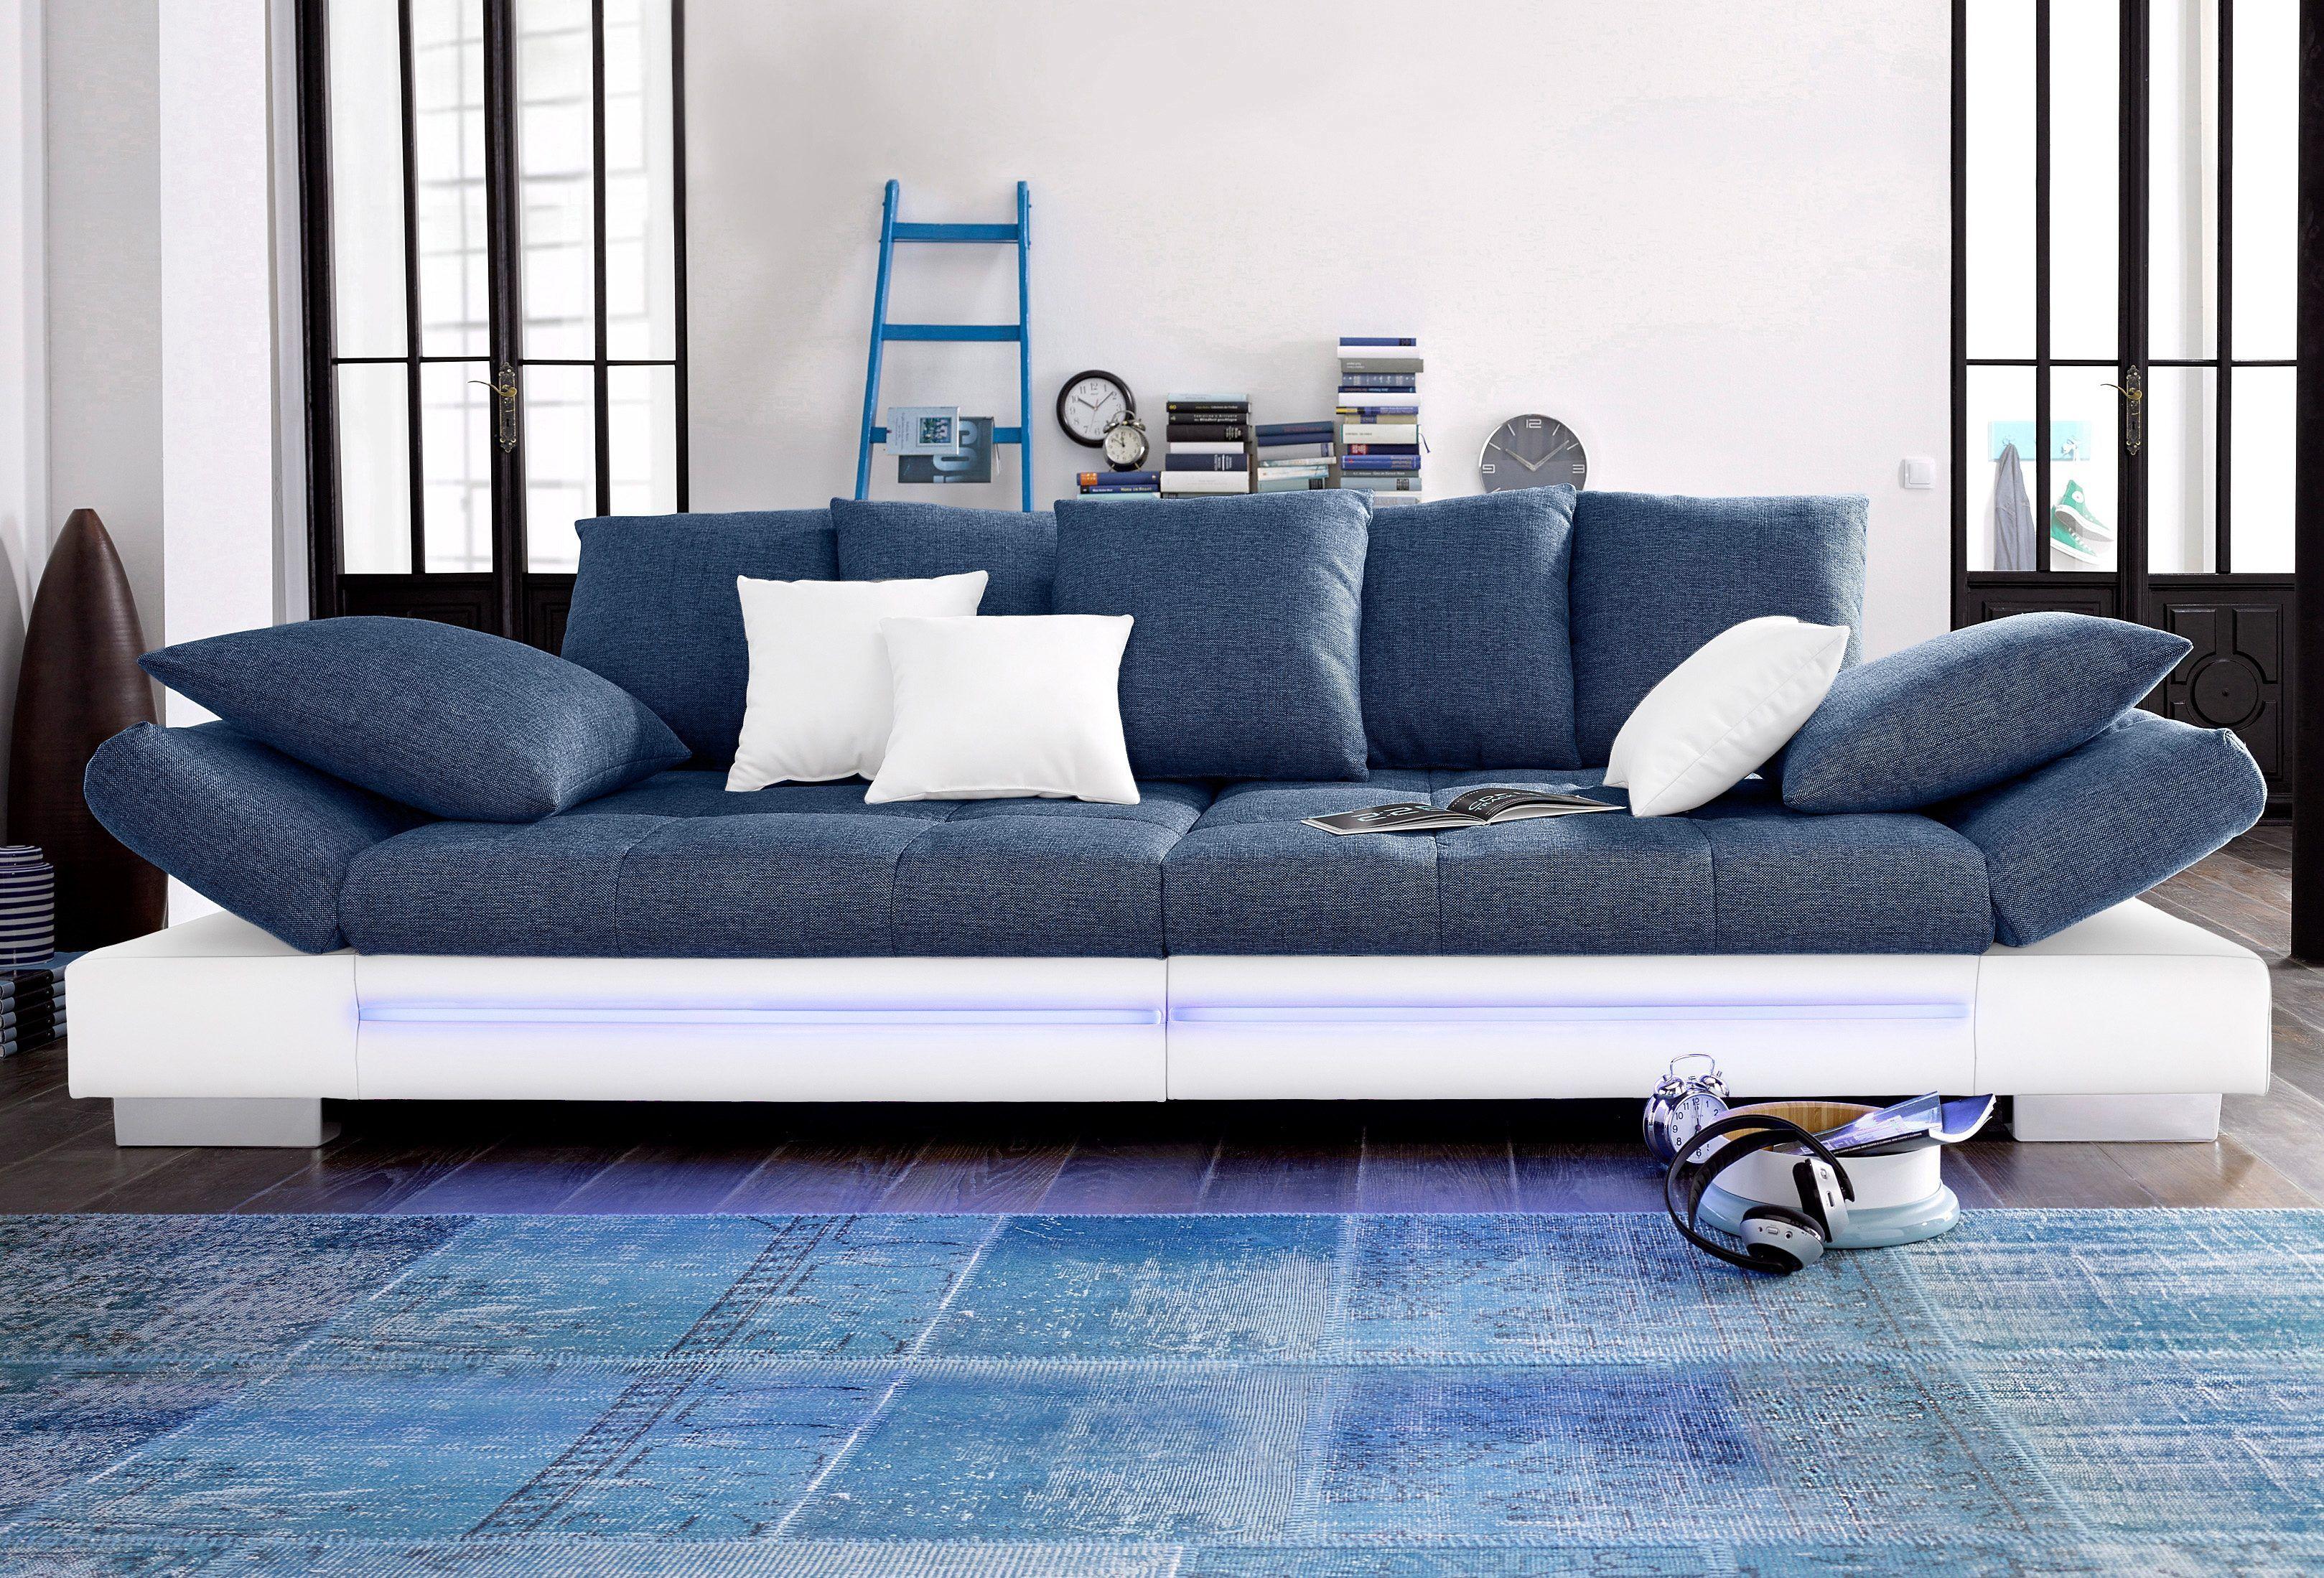 Big Sofa Weiss Mit Rgb Led Beleuchtung Energieeffizienzklasse A